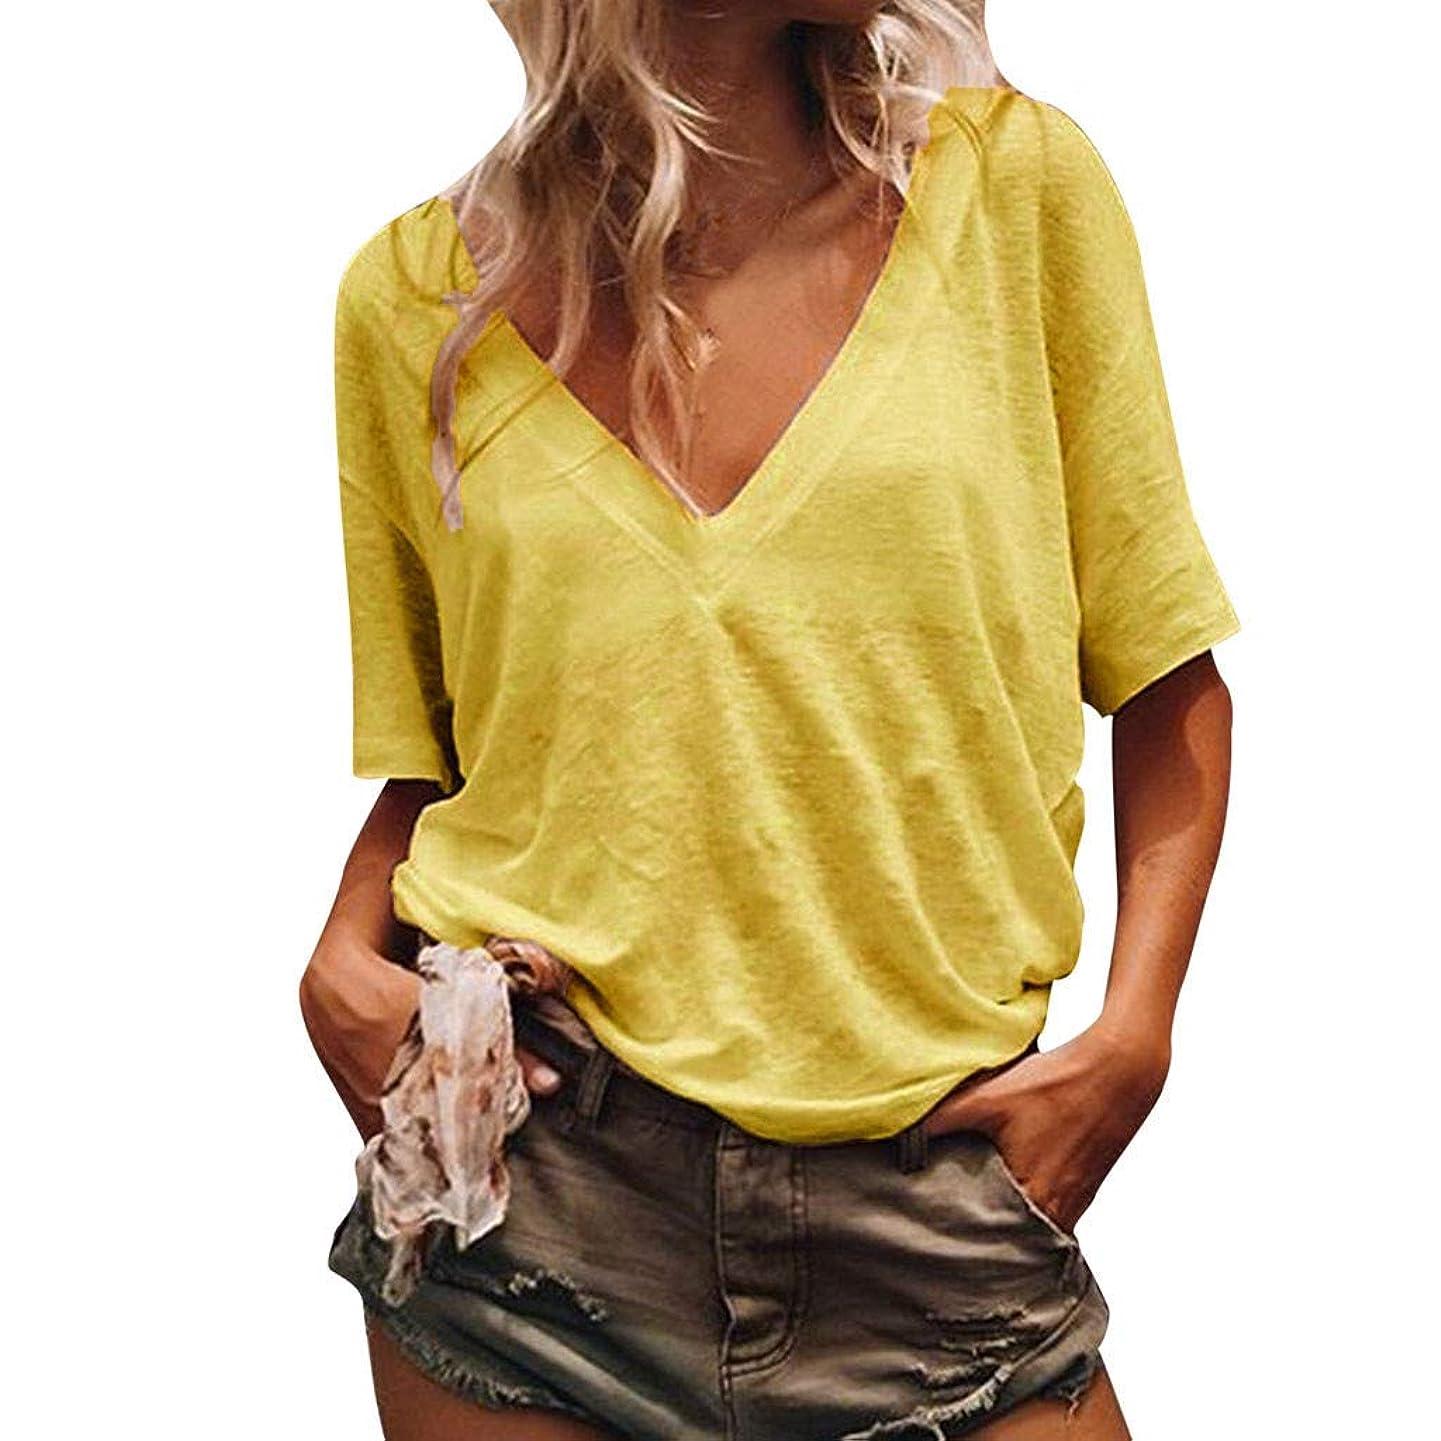 Women's Loose Casual T-Shirt, Sharemen Solid Color V-Neck Short-Sleeved Shirt Summer T-Shirt with Jeans/Skirt